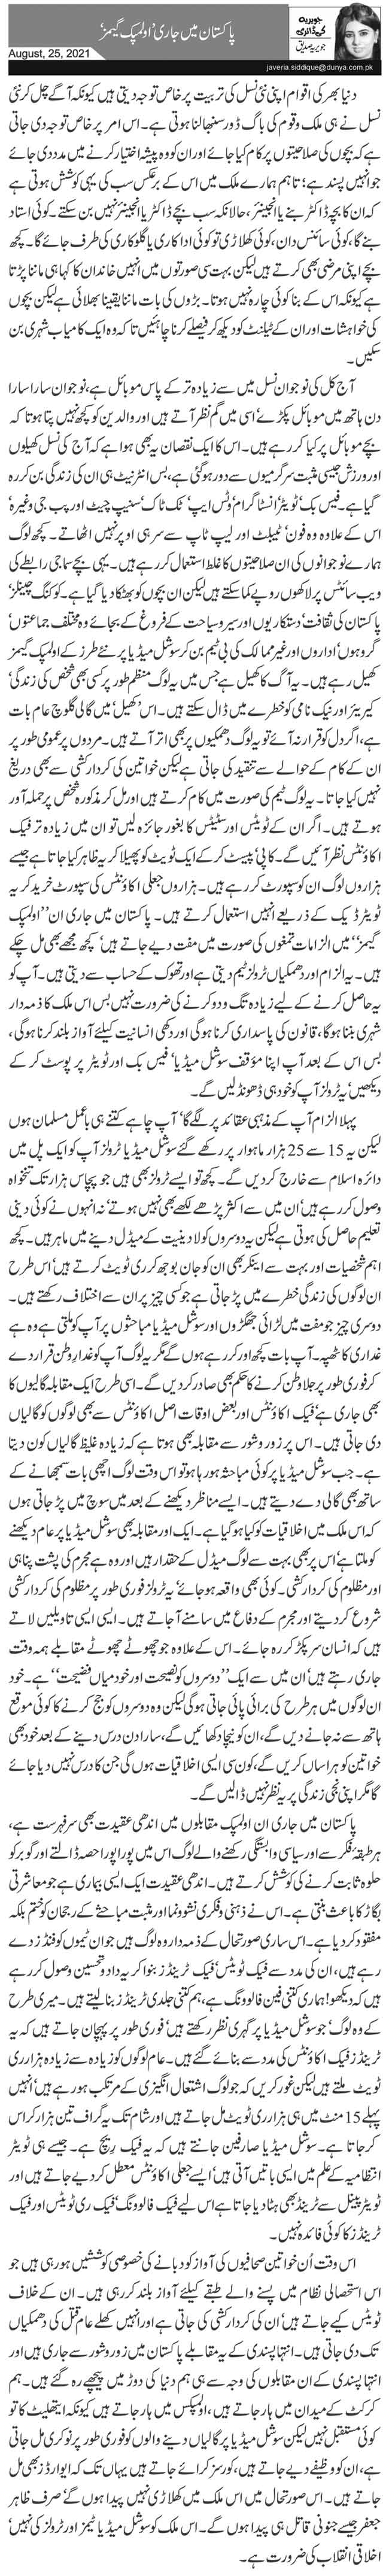 پاکستان میں جاری 'اولمپک گیمز'